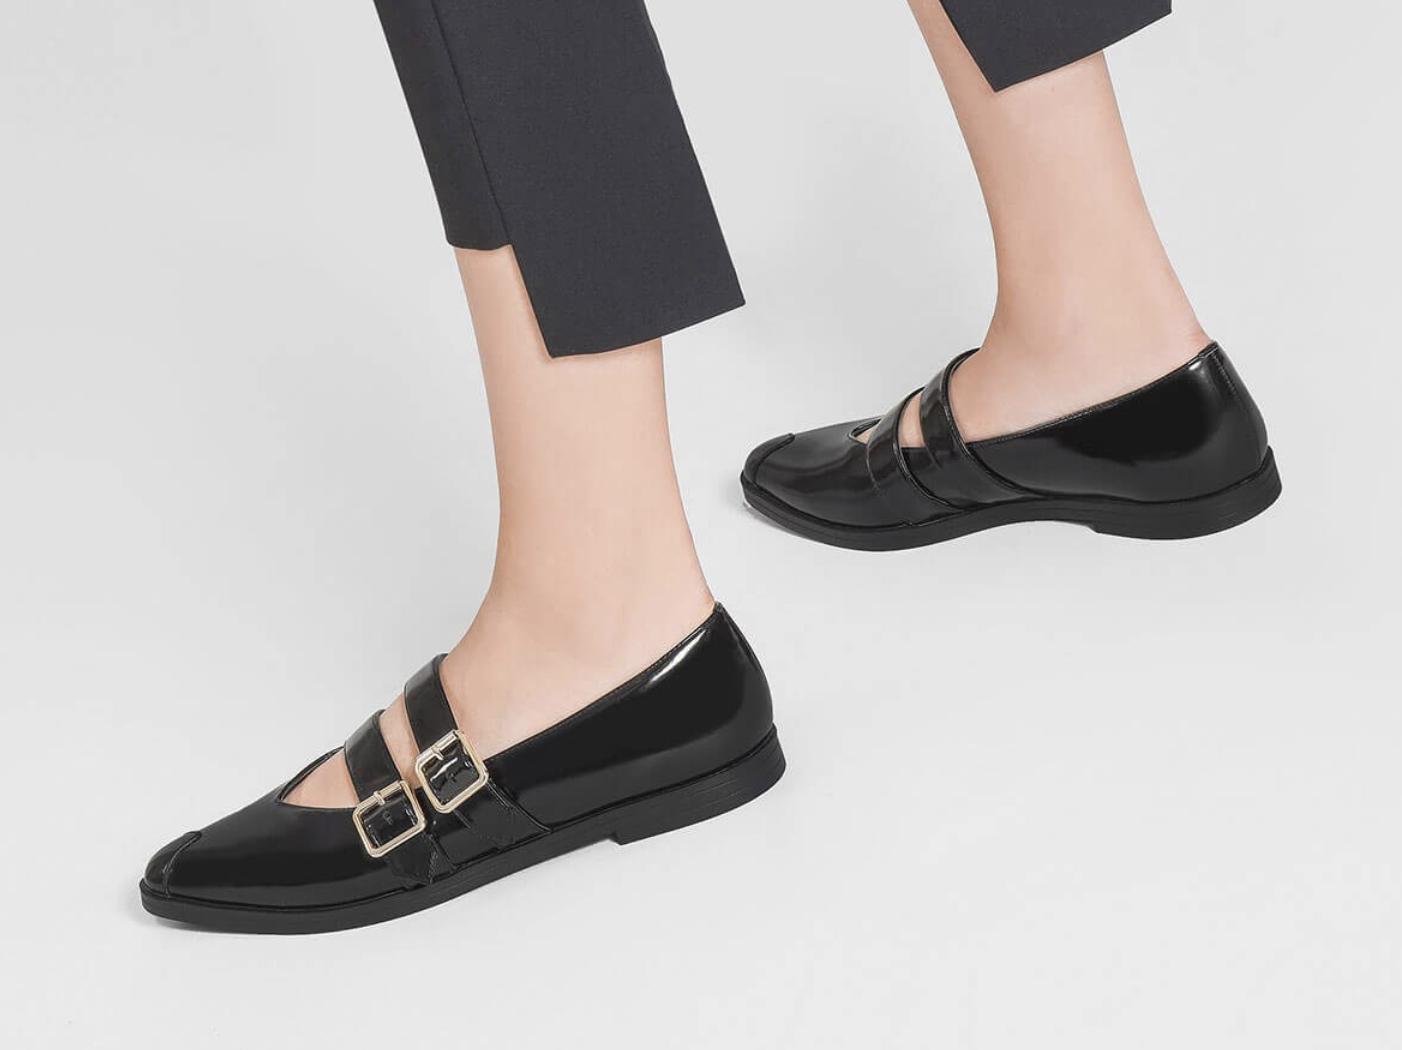 Charles and Keith Flat Shoes Diskon 30%